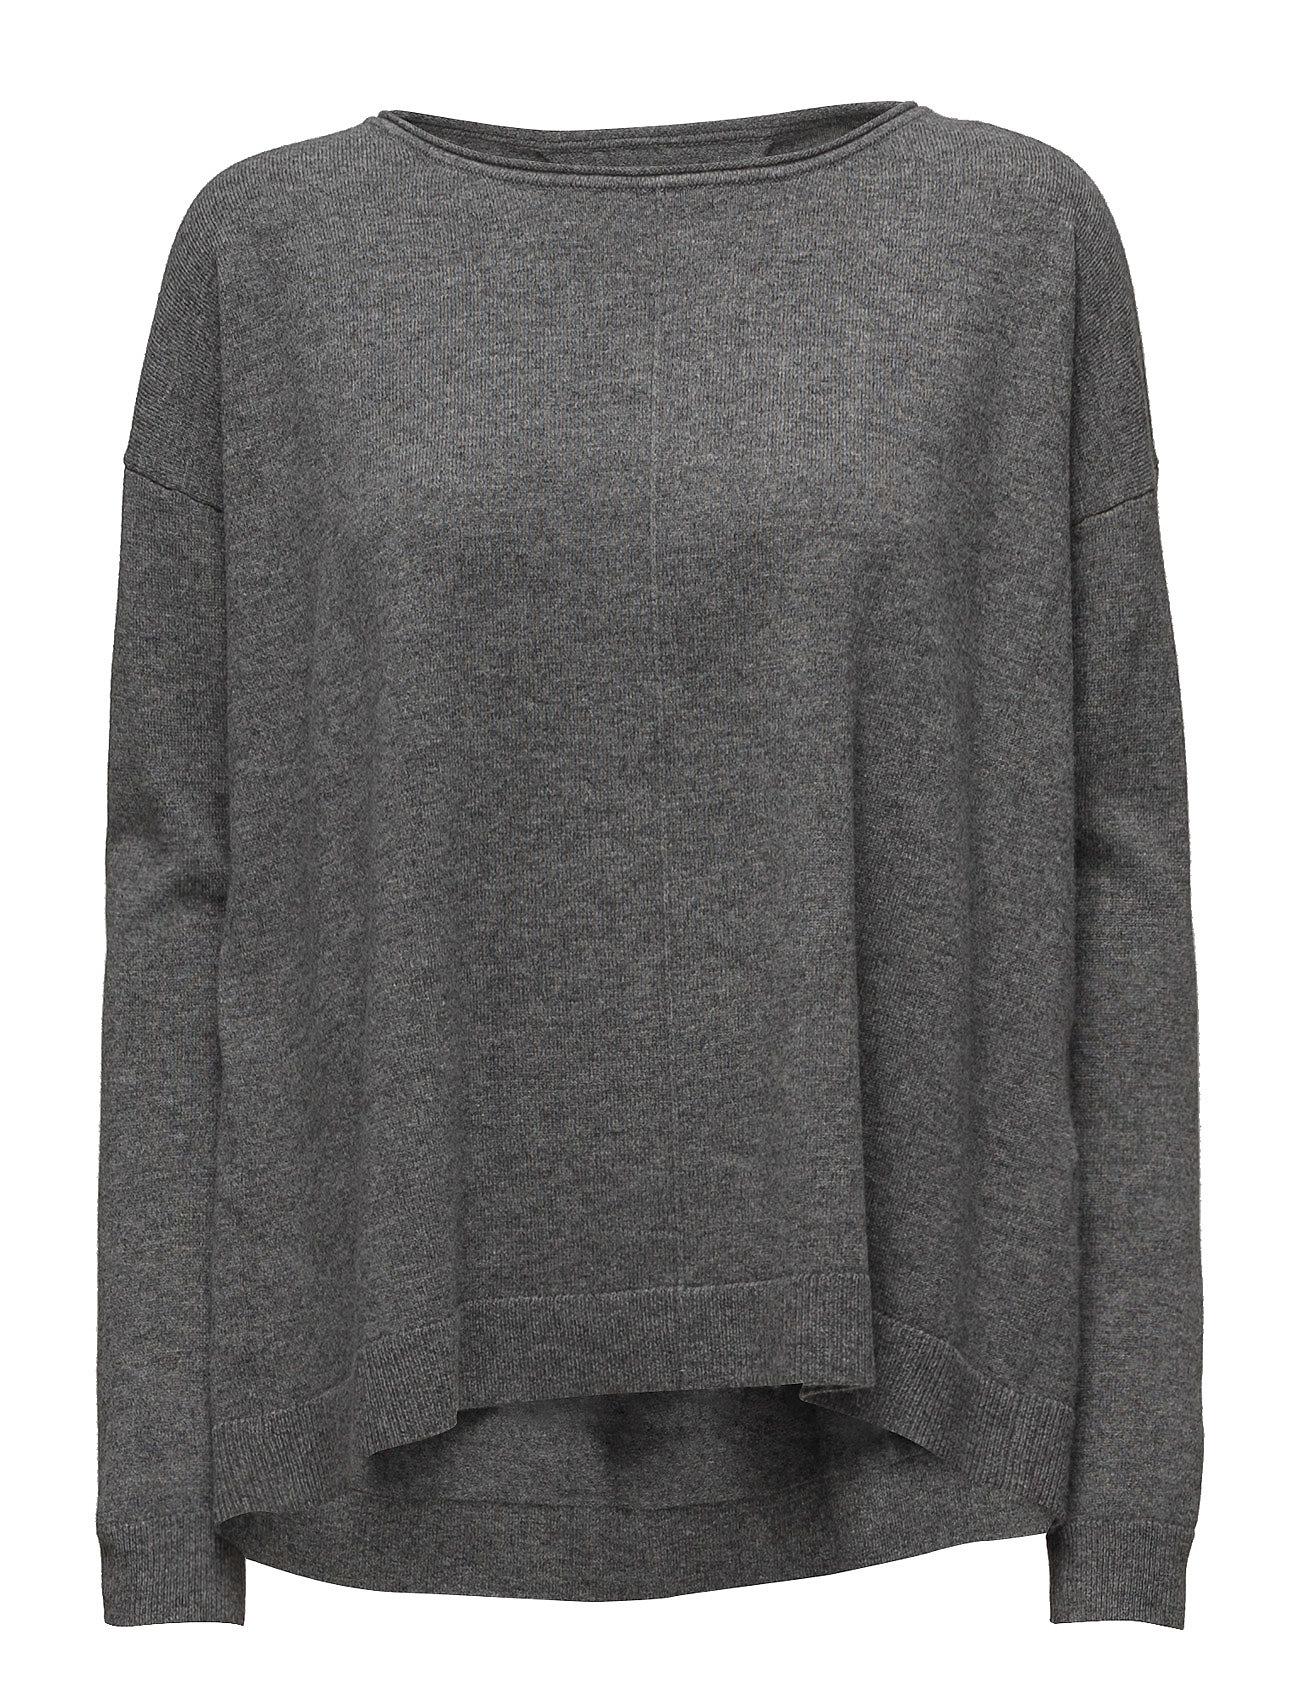 Twikkian By Malene Birger Sweatshirts til Damer i Med Grey Mel